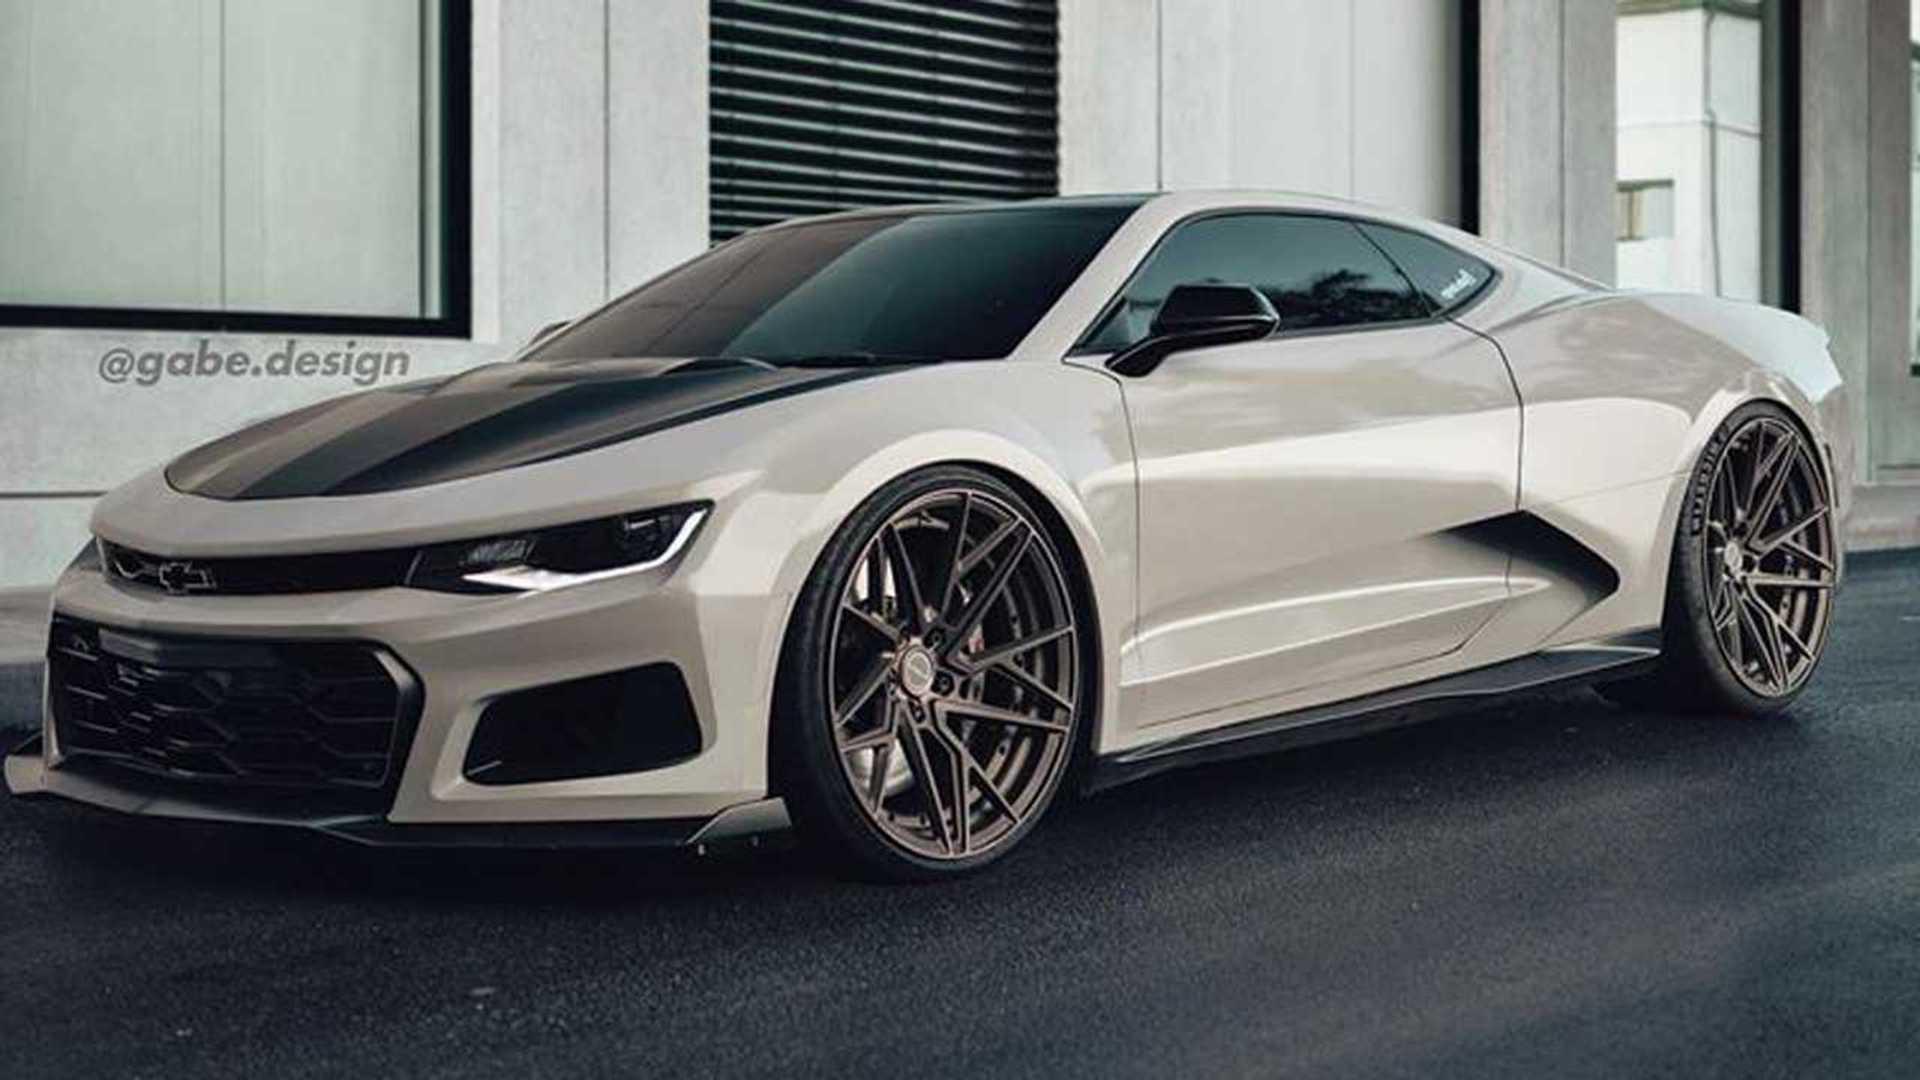 Kelebihan Kekurangan Corvette Camaro Top Model Tahun Ini